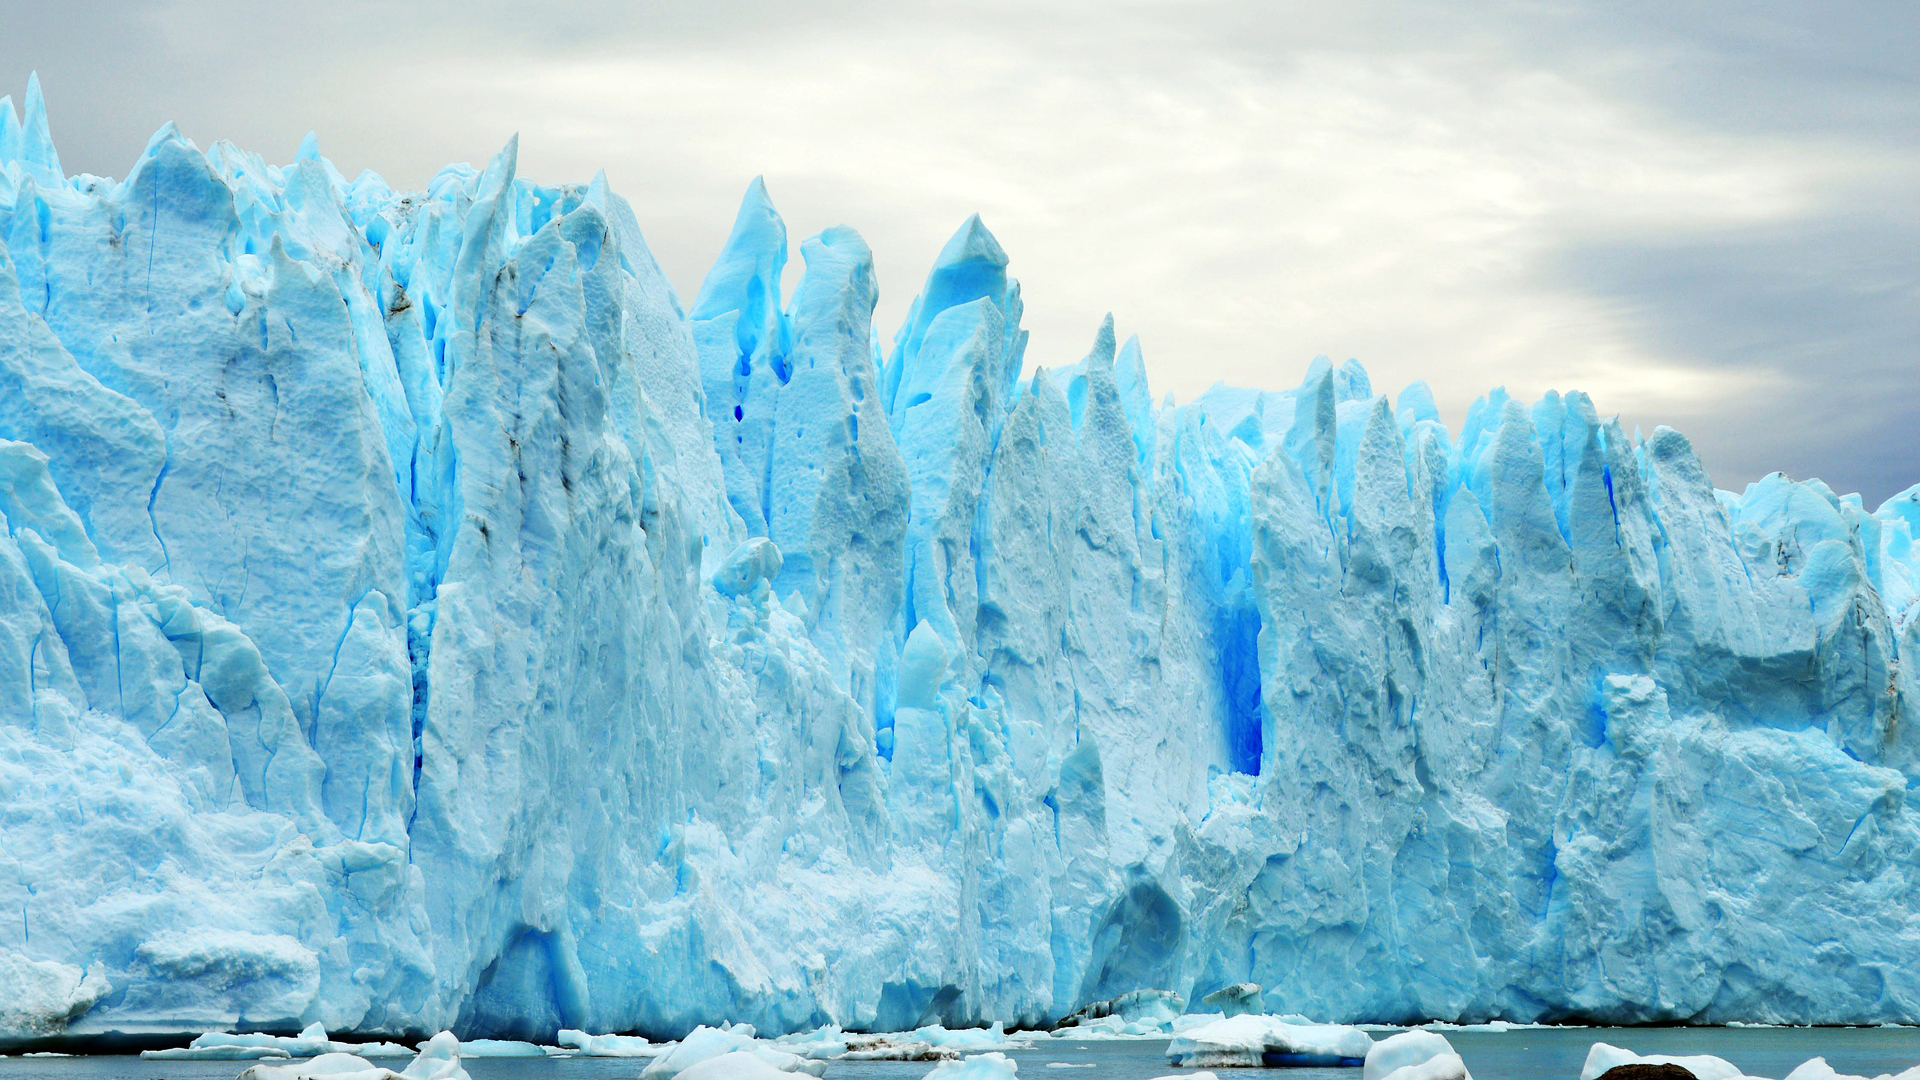 patagonia-389306_1920.jpg